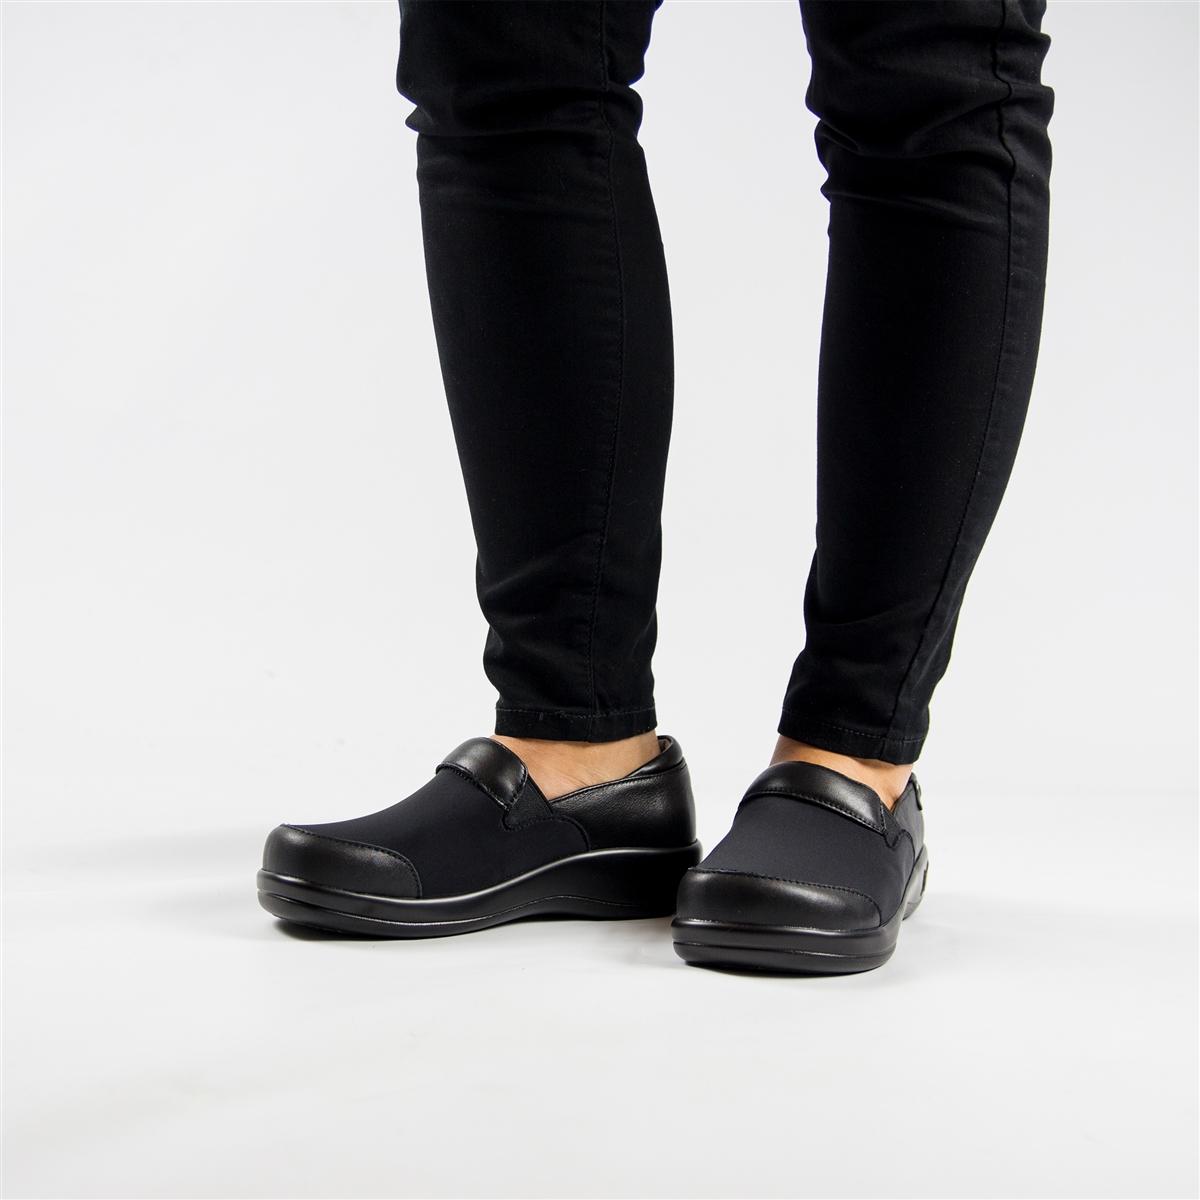 Alegria Shoes - Keli Black Nappa